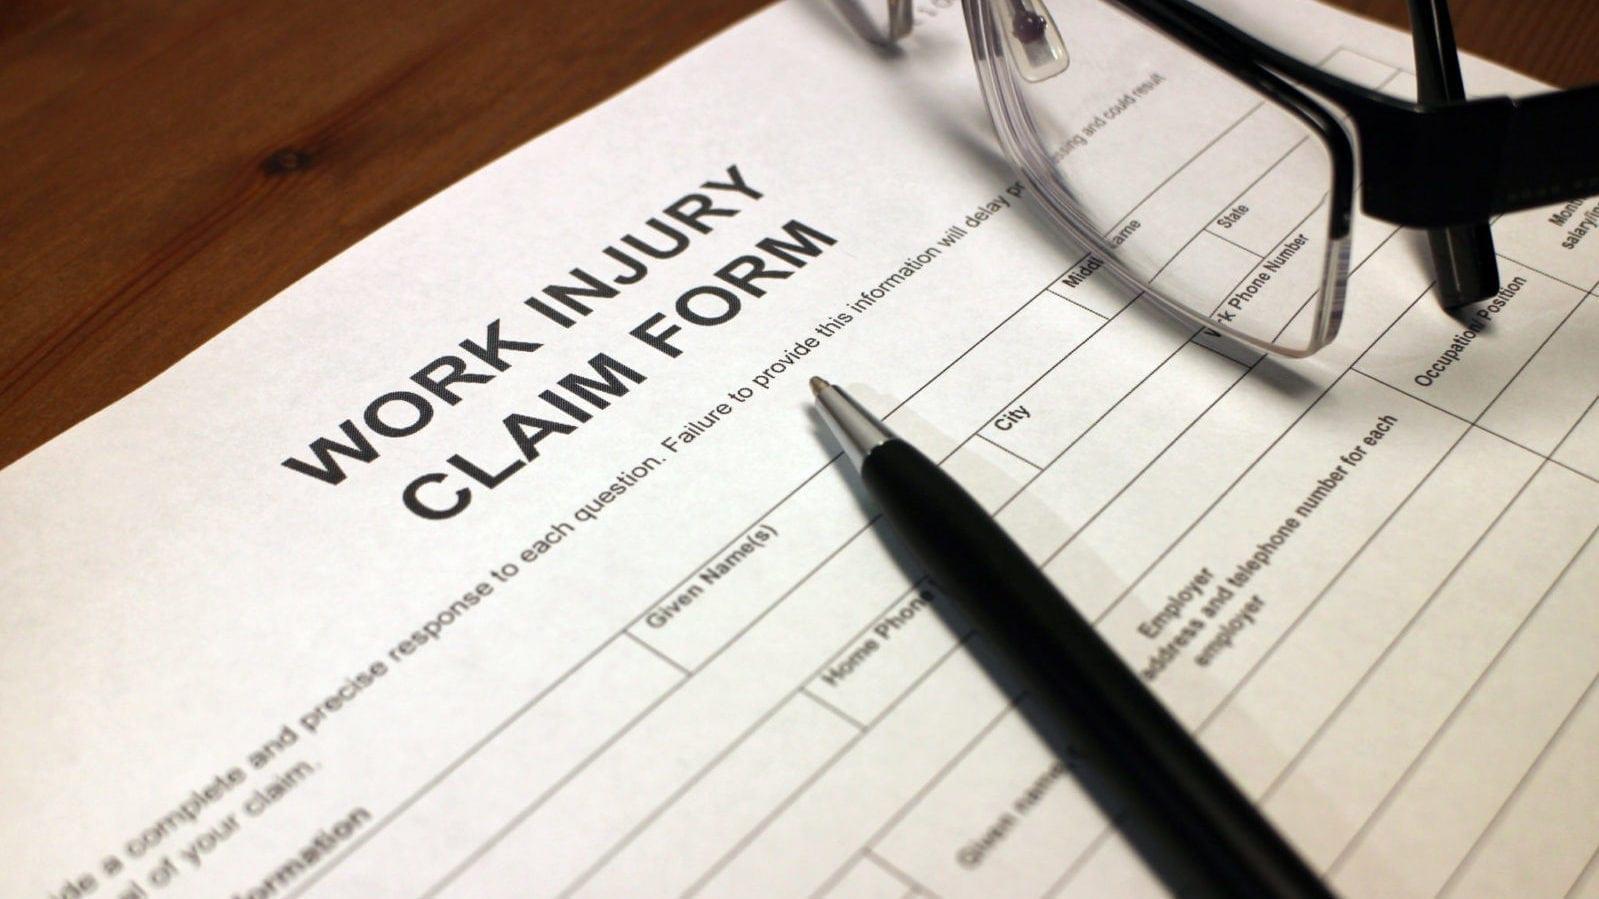 Blank Work Injury Claim Form Stock Photo